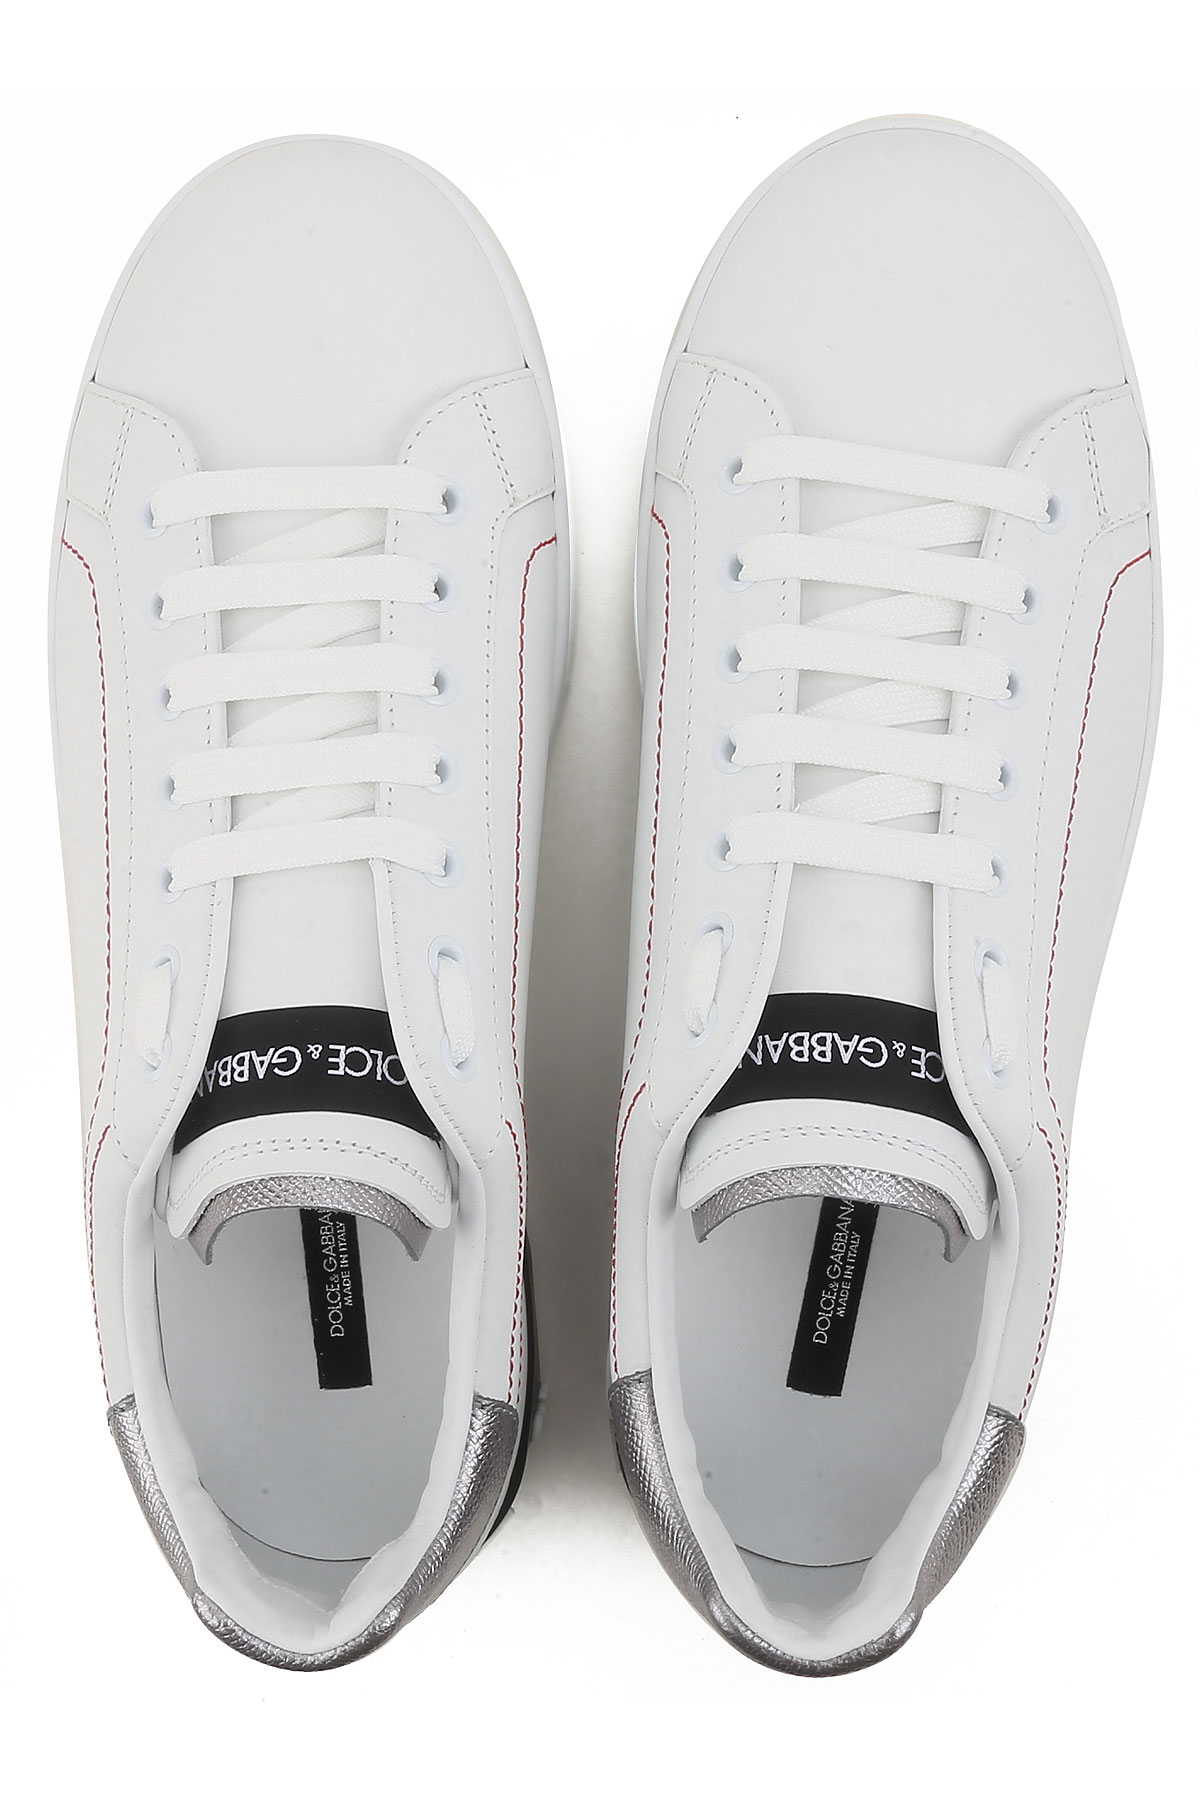 Gabbana amp; Zapatos Blanco Para Dolce Plata 2019 Primavera verano Hombres 45qCdnEFxw